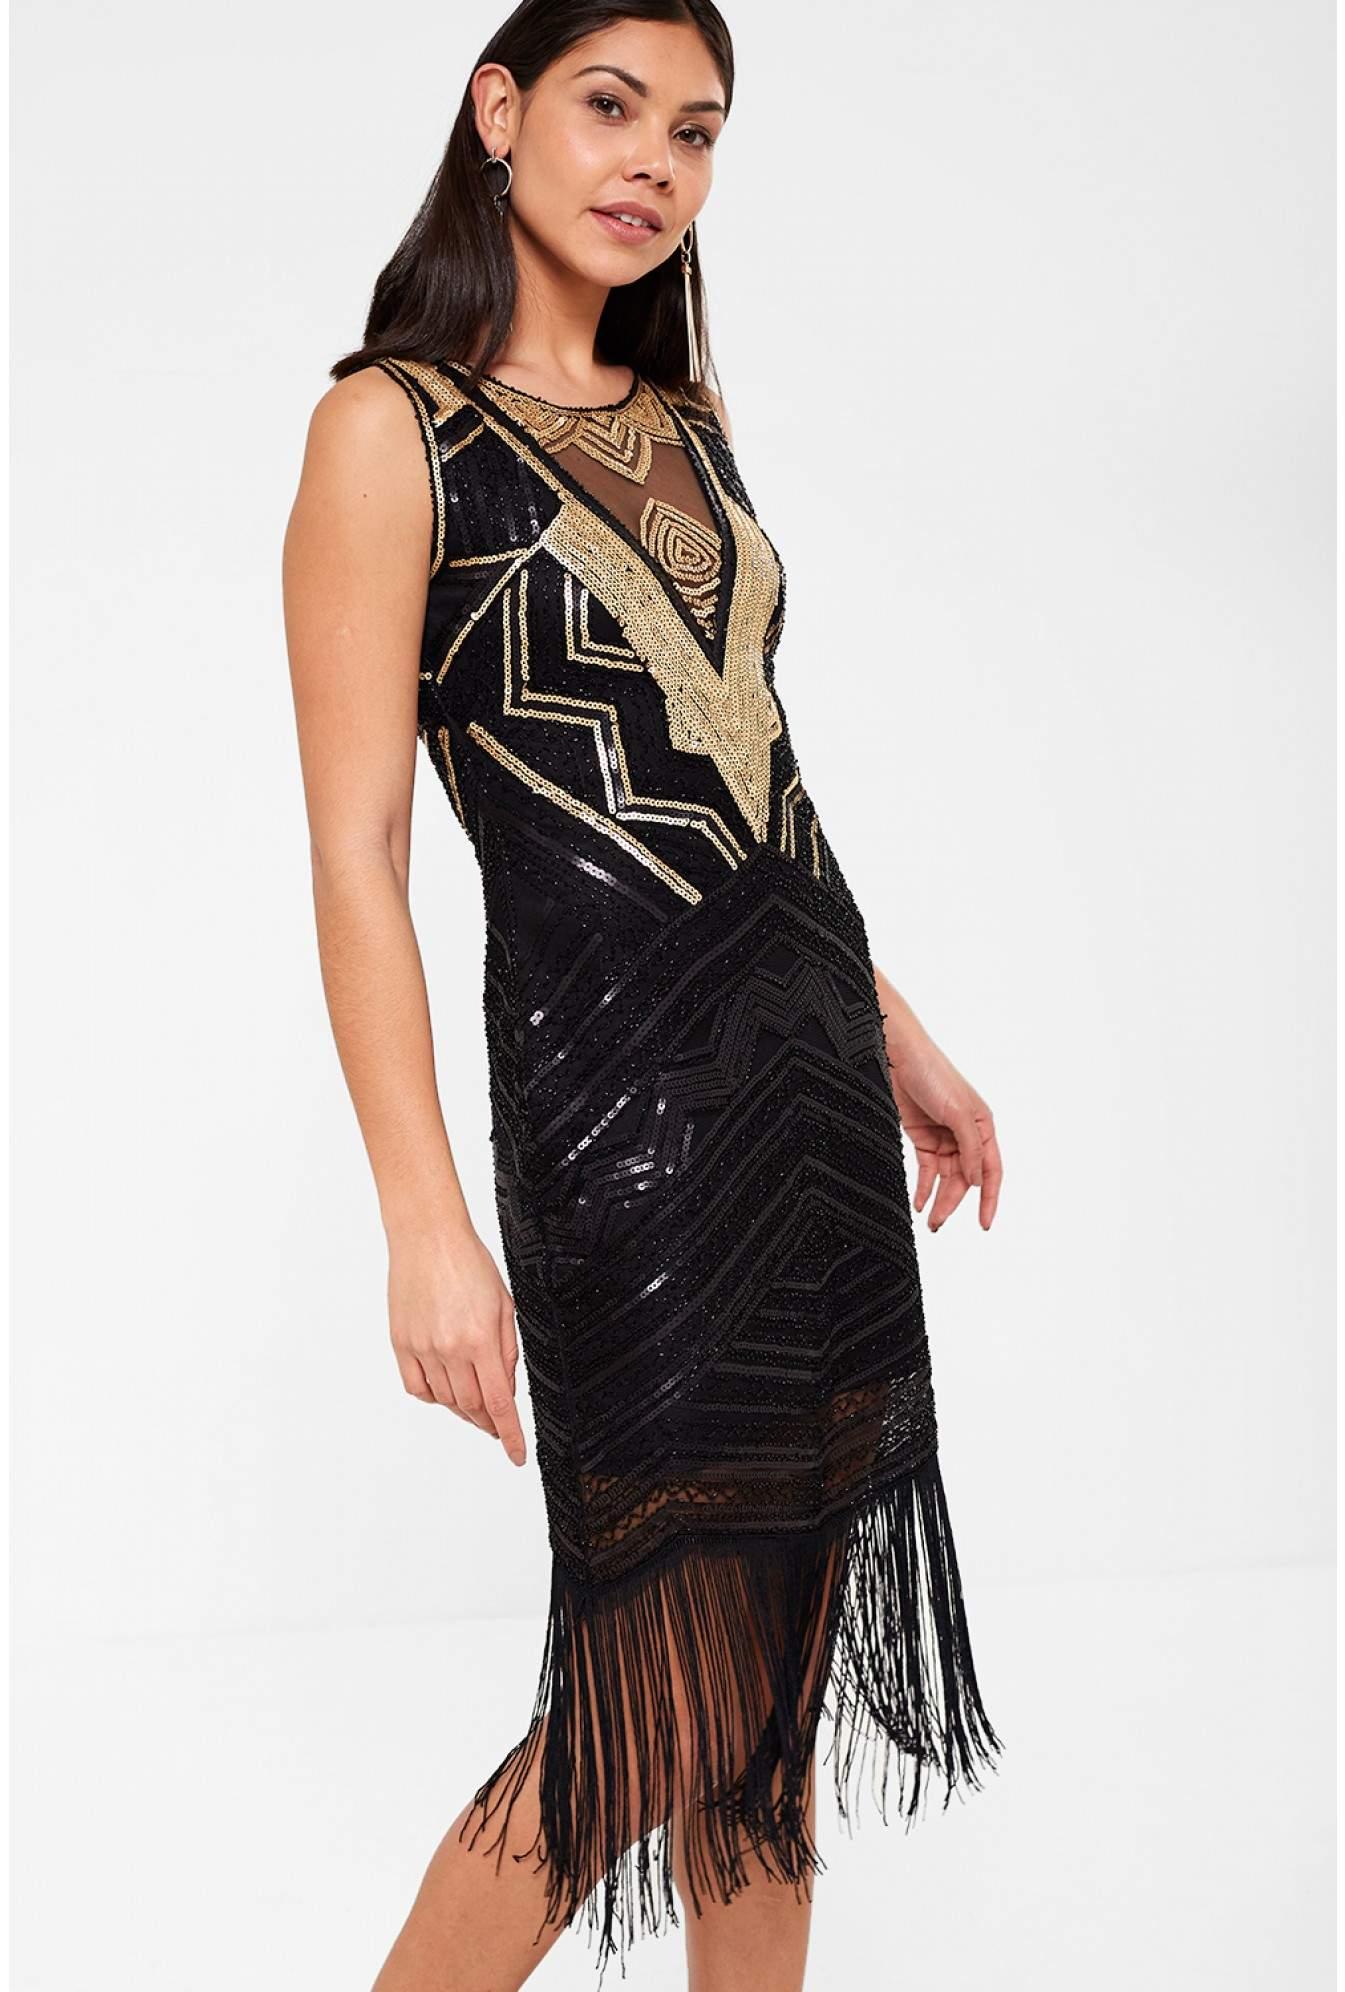 67808a2556e4 Stella Sophia Sequin Dress with Tassle Hem in Black | iCLOTHING